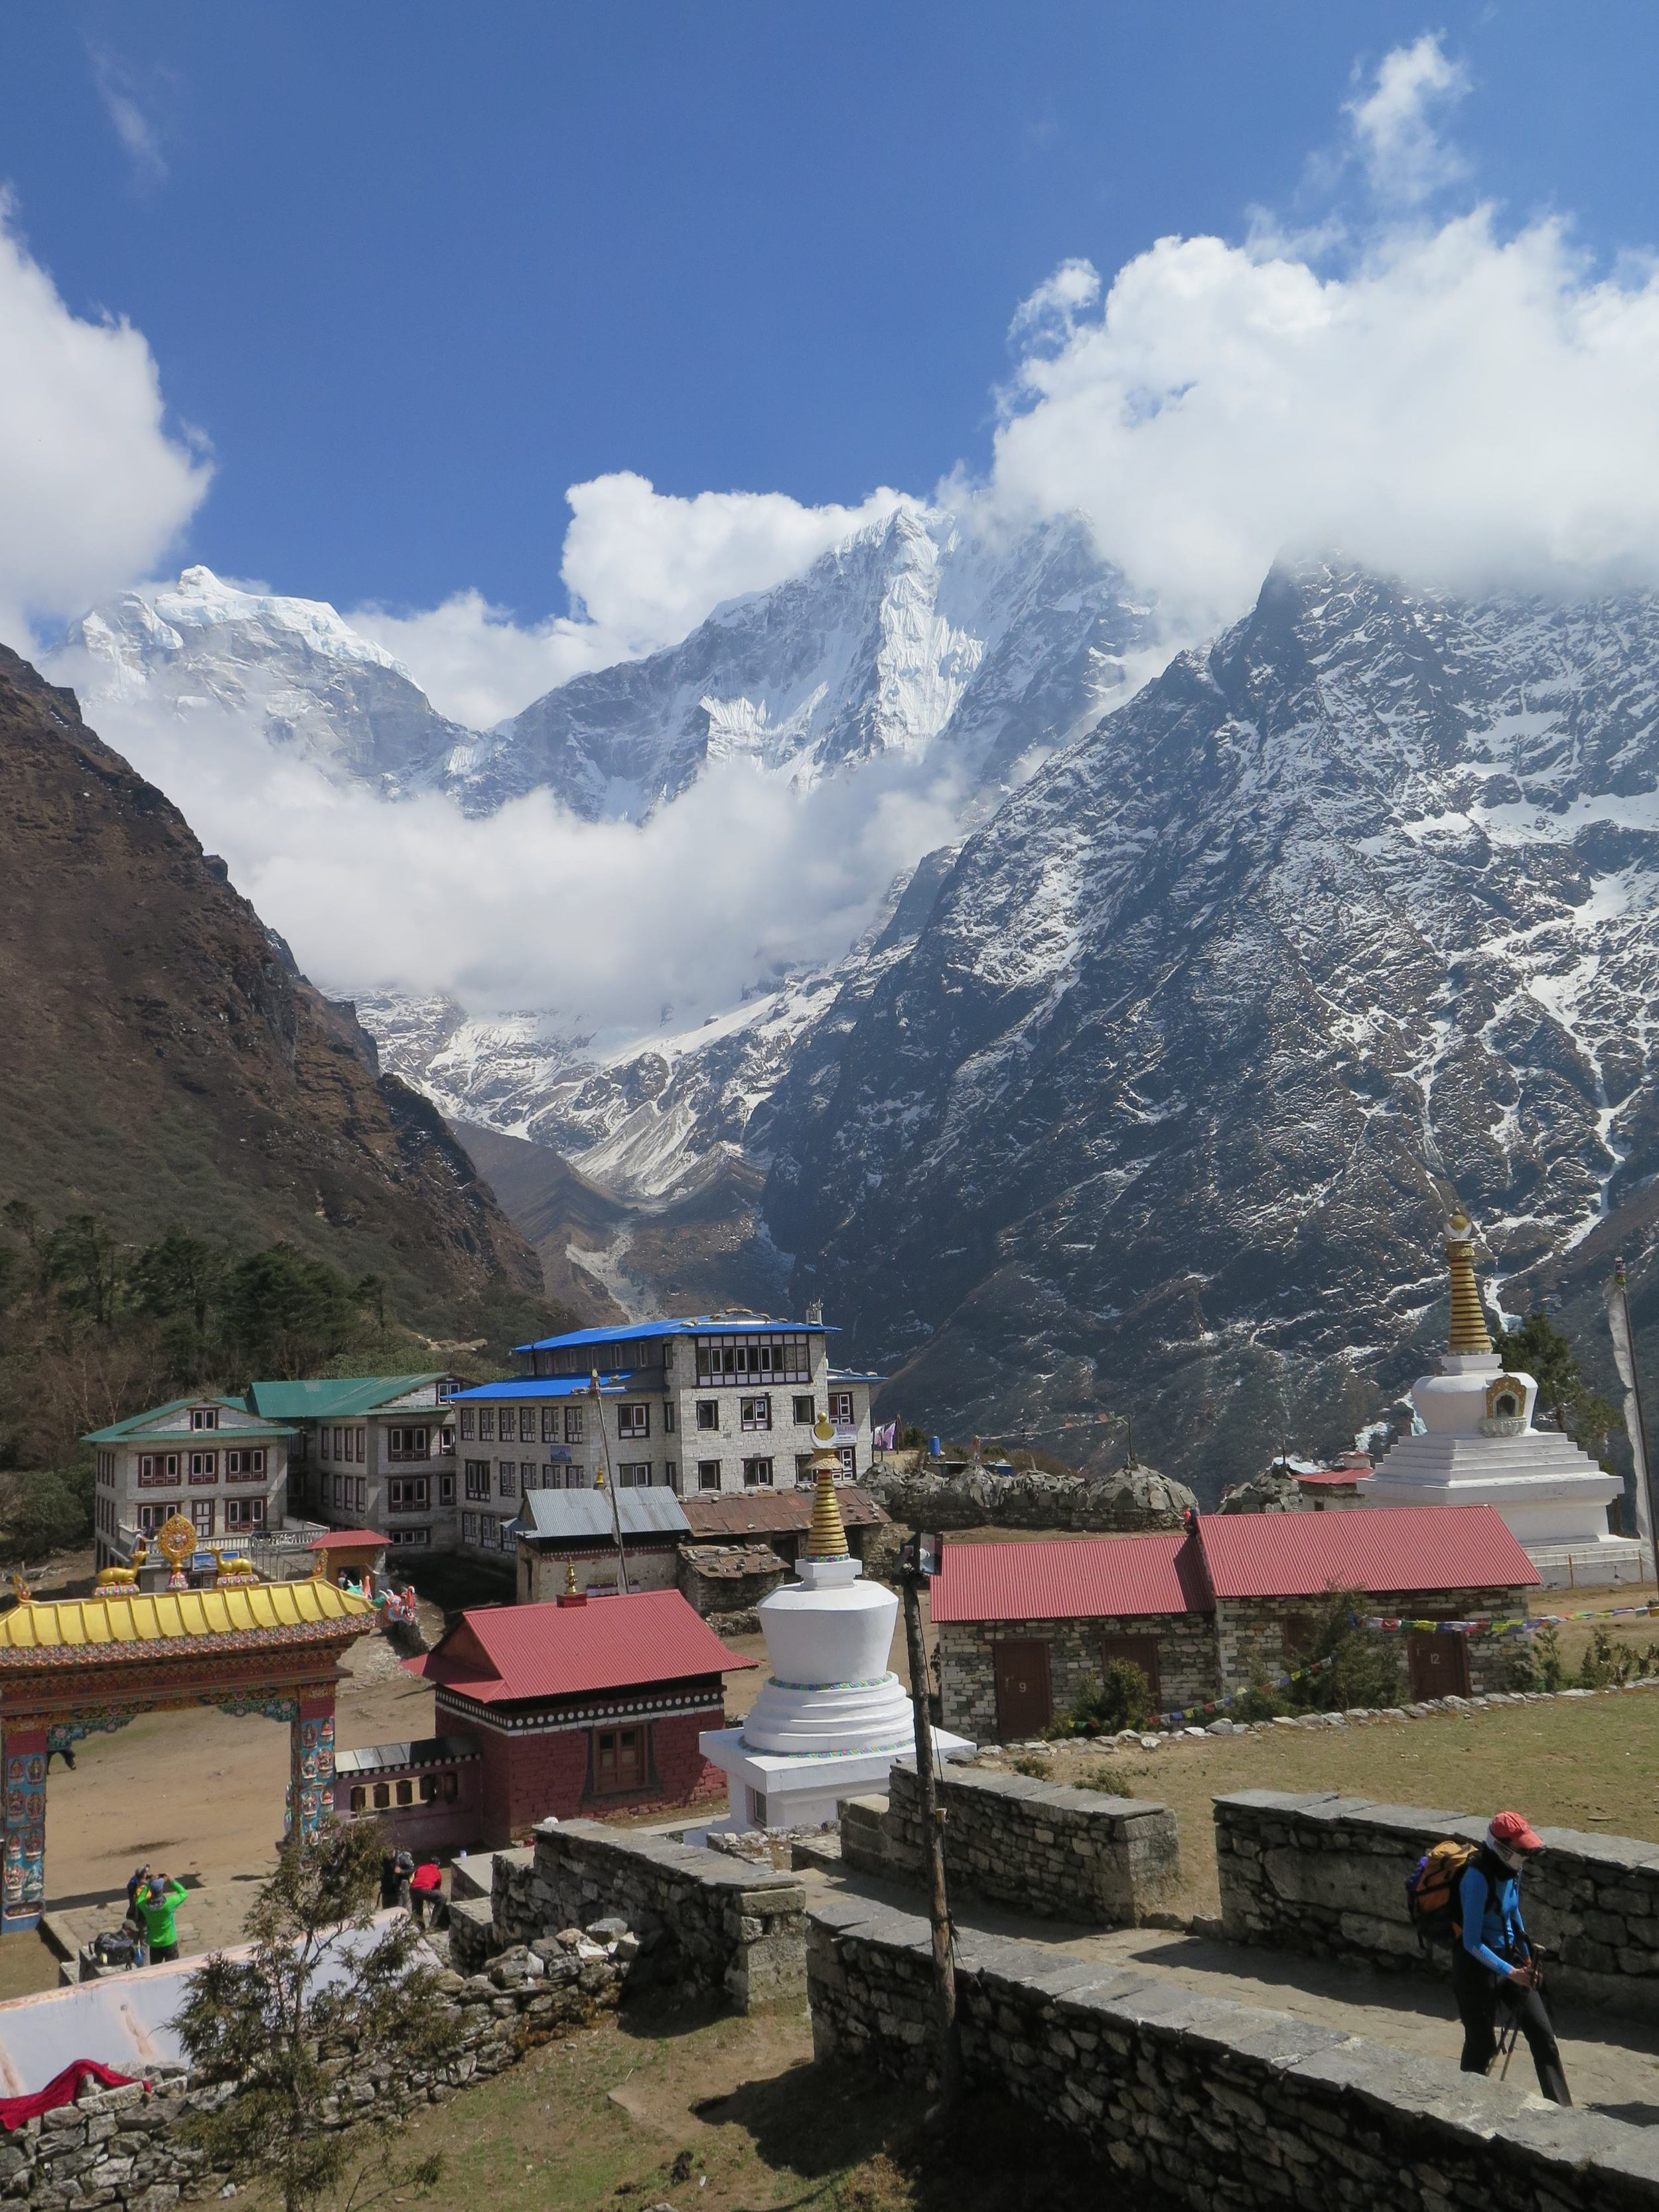 Tengboche'den uzaklardaki Everest / From Tengboche Everest at far away